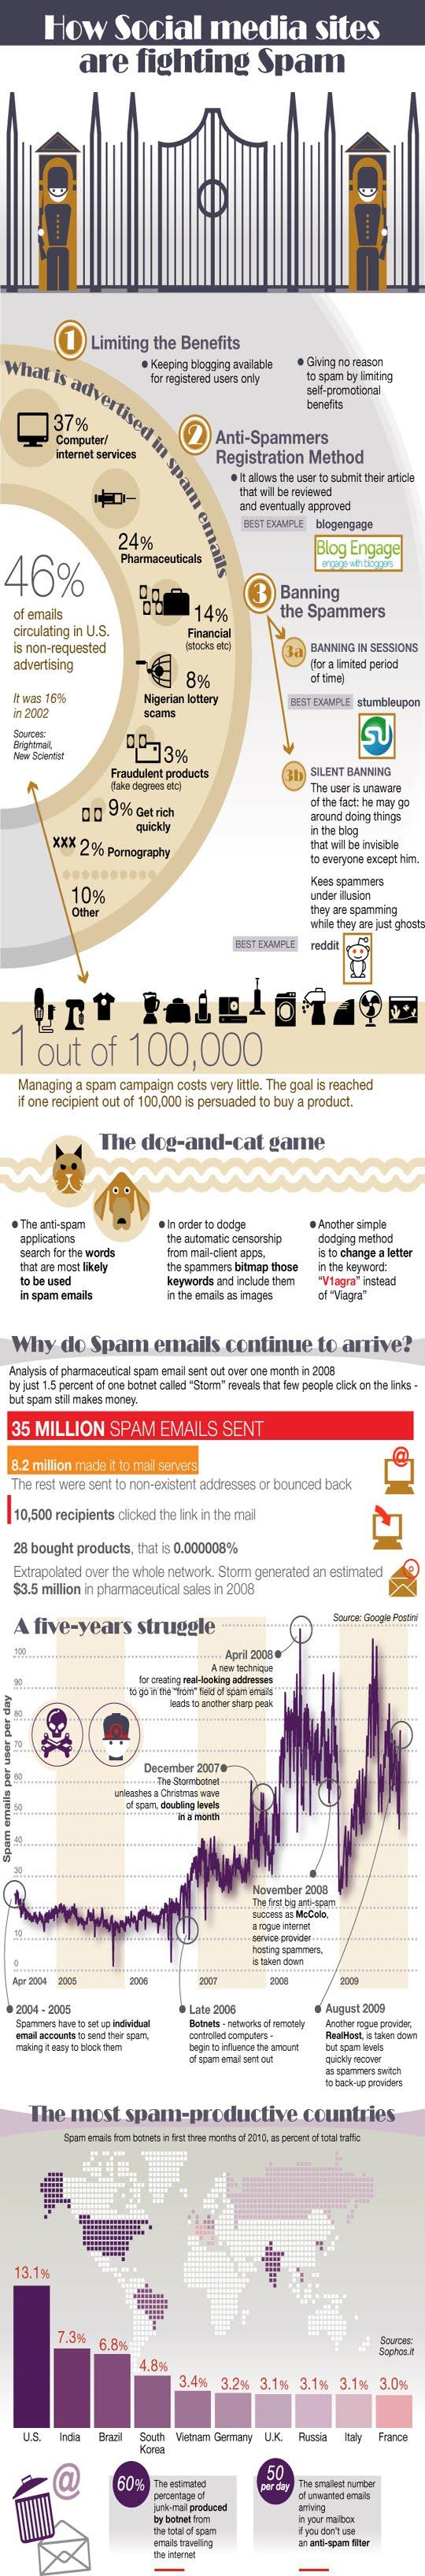 spam02 thumb